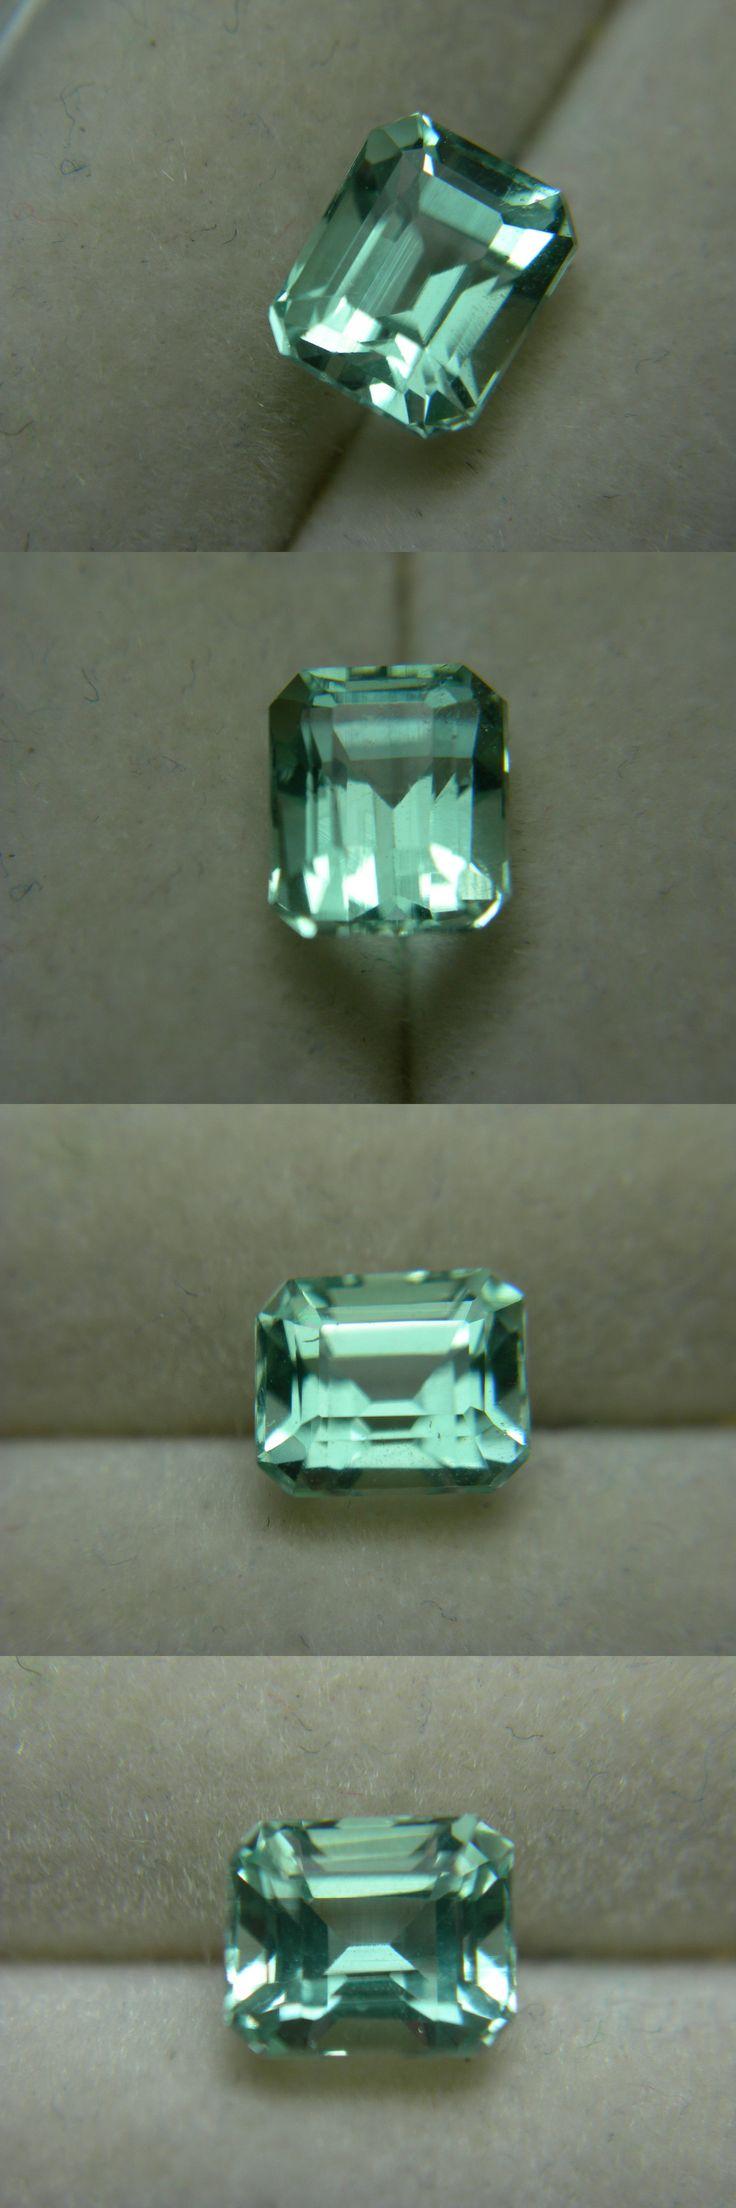 Tourmaline 10278: Rare Teal Green Blue Tourmaline Gem Brazil Natural Paraiba Color 1.0Ct Gemstone BUY IT NOW ONLY: $799.99